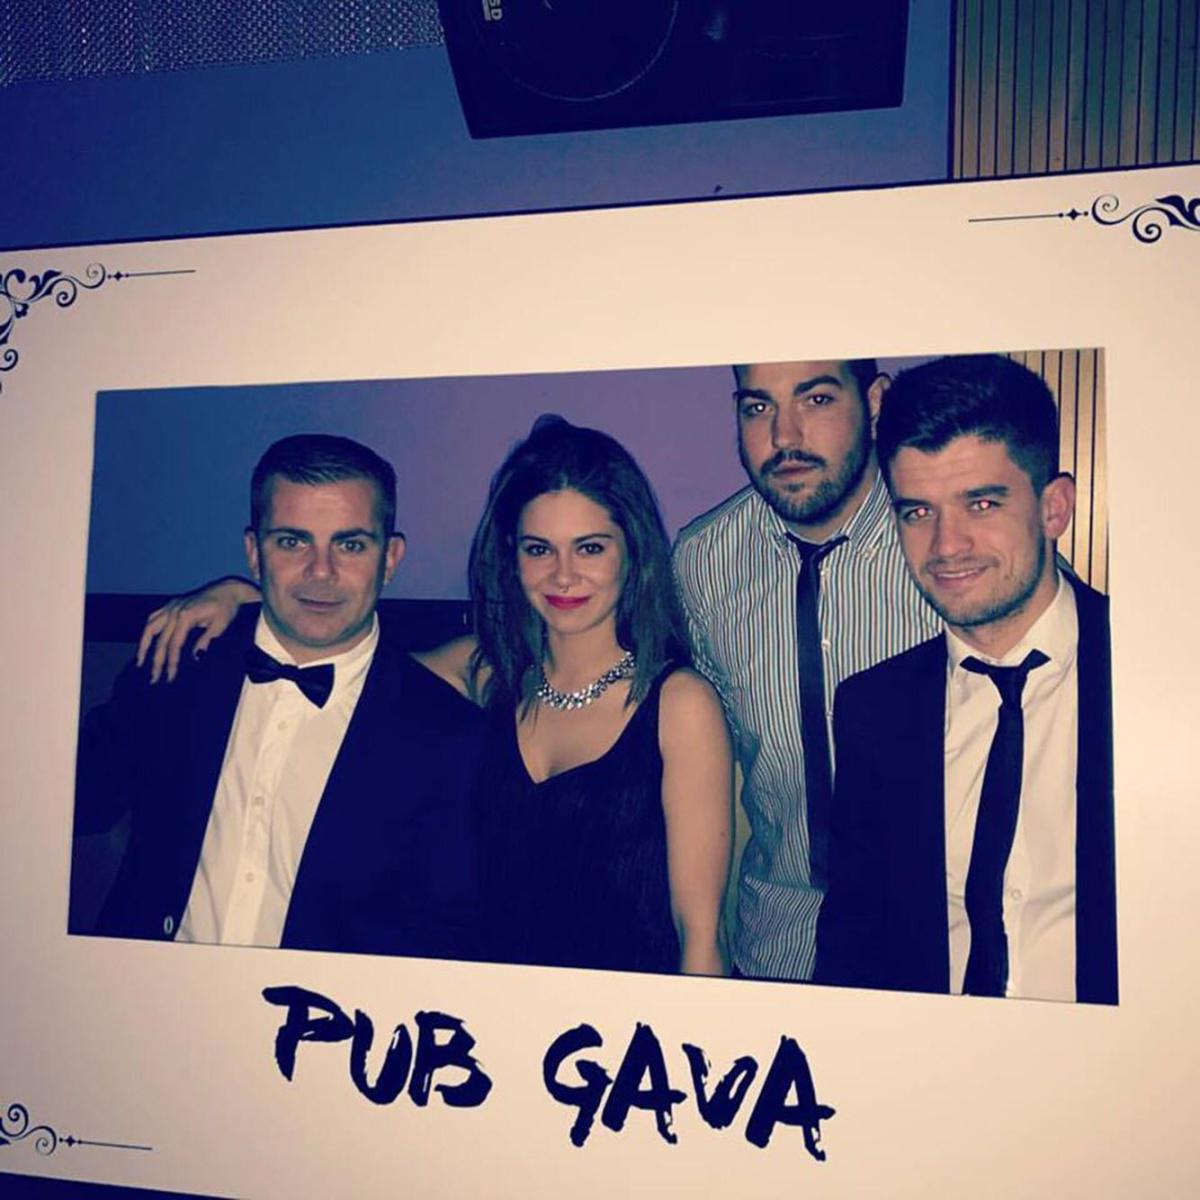 Pub Gavá